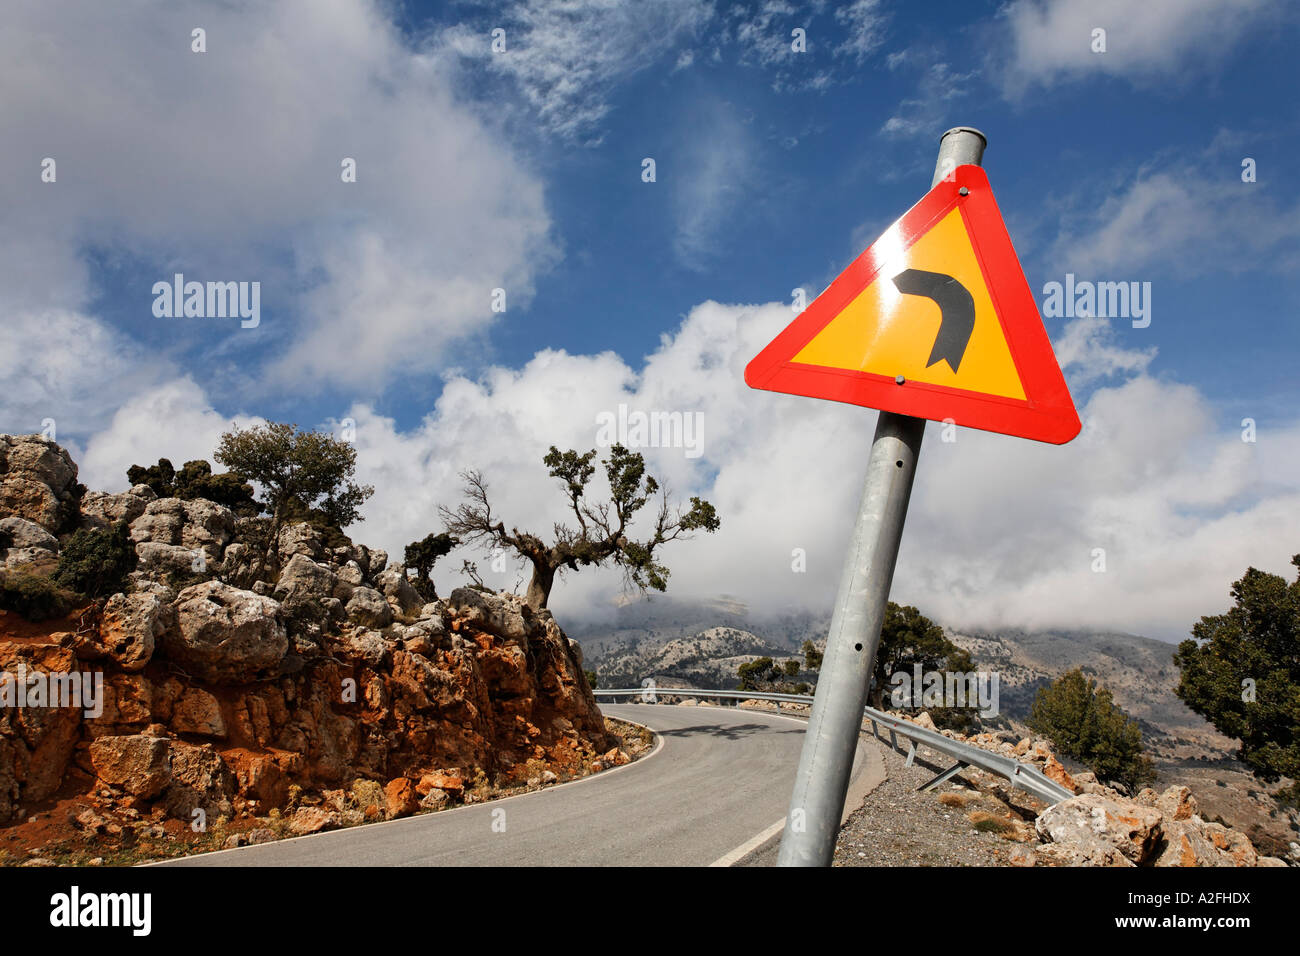 Road Sign Curves ahead, mountain road, Kritsa, Crete, Greece - Stock Image